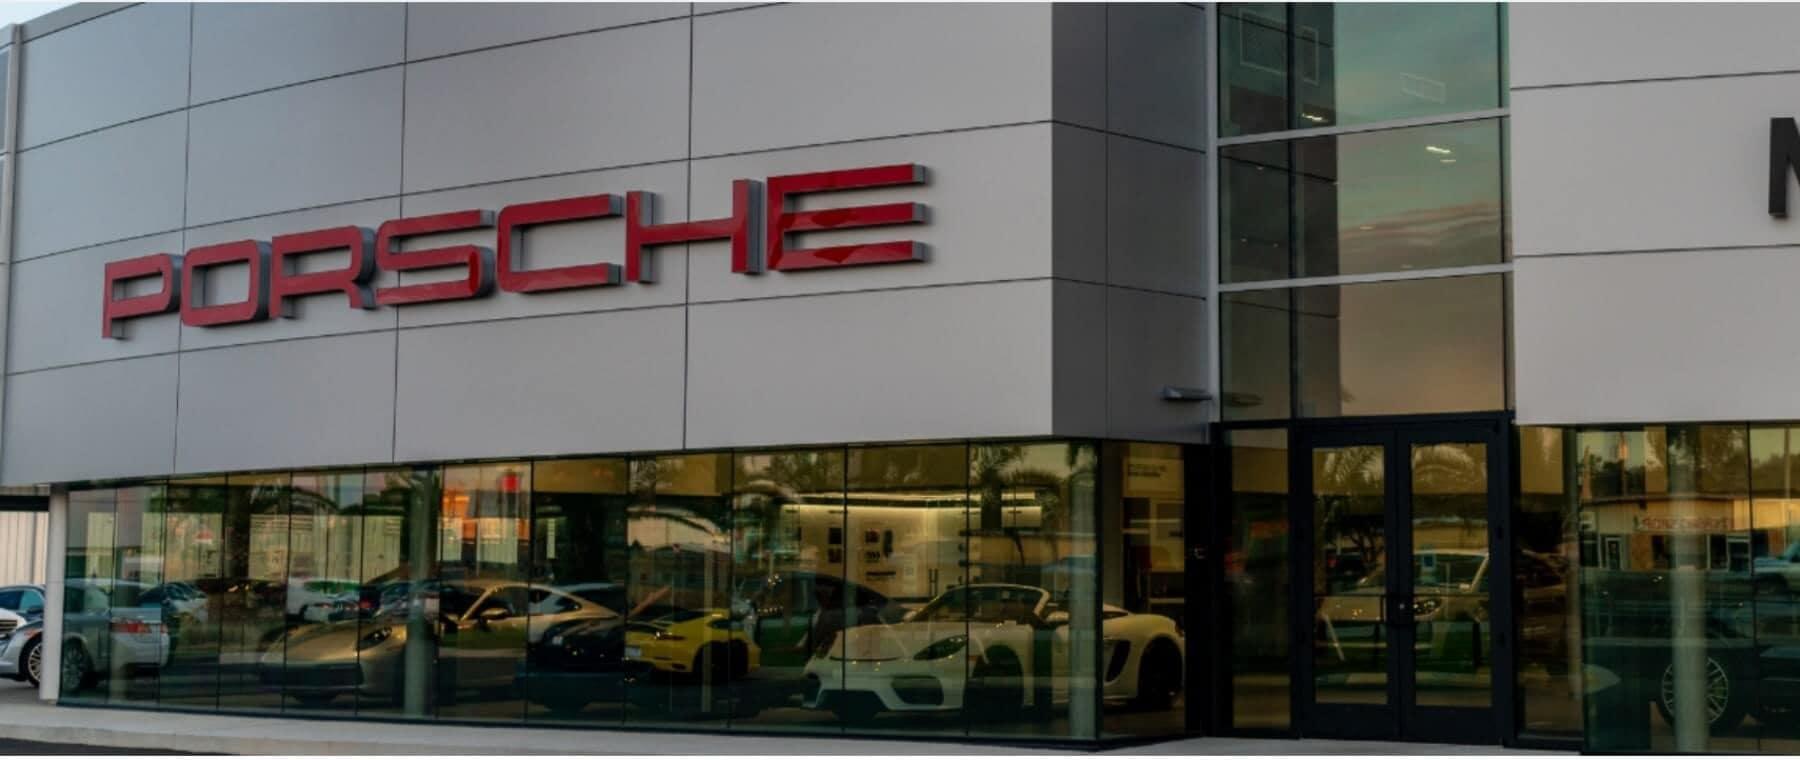 Porsche Mobile Dealership Front